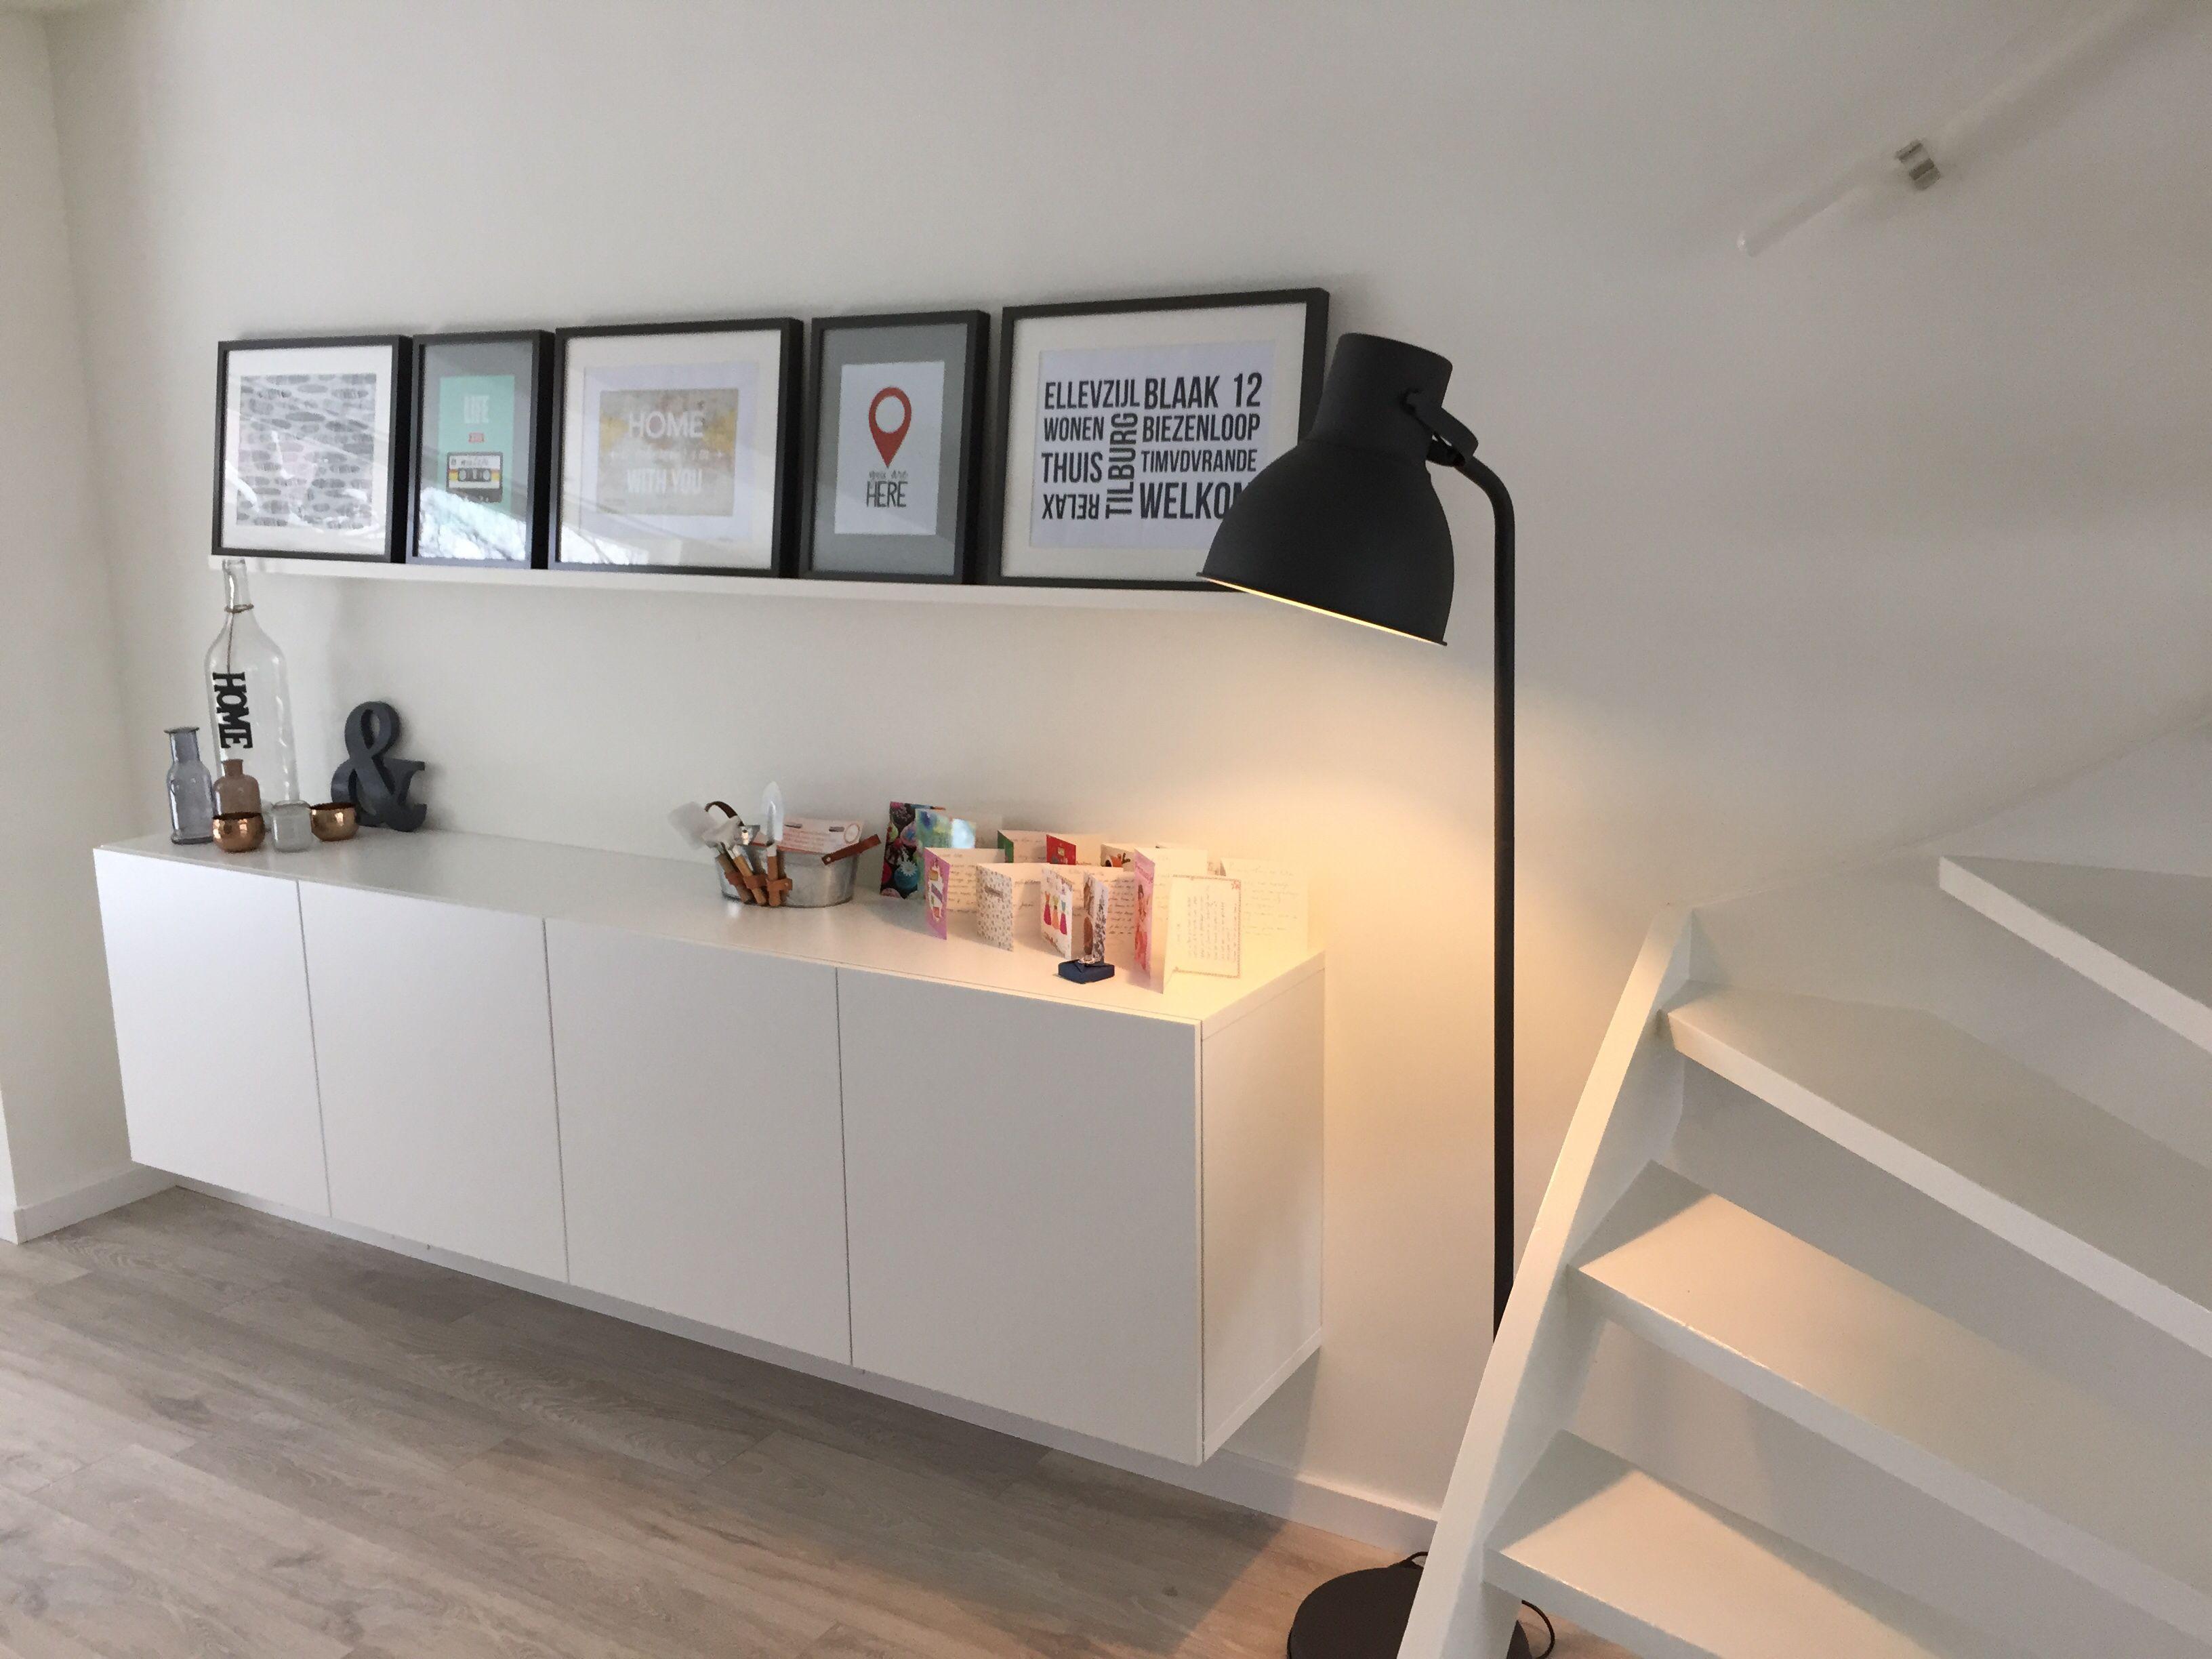 Ikea Lampen Staand : Hangend meubel ikea en staande fotolijsten op plank lamp